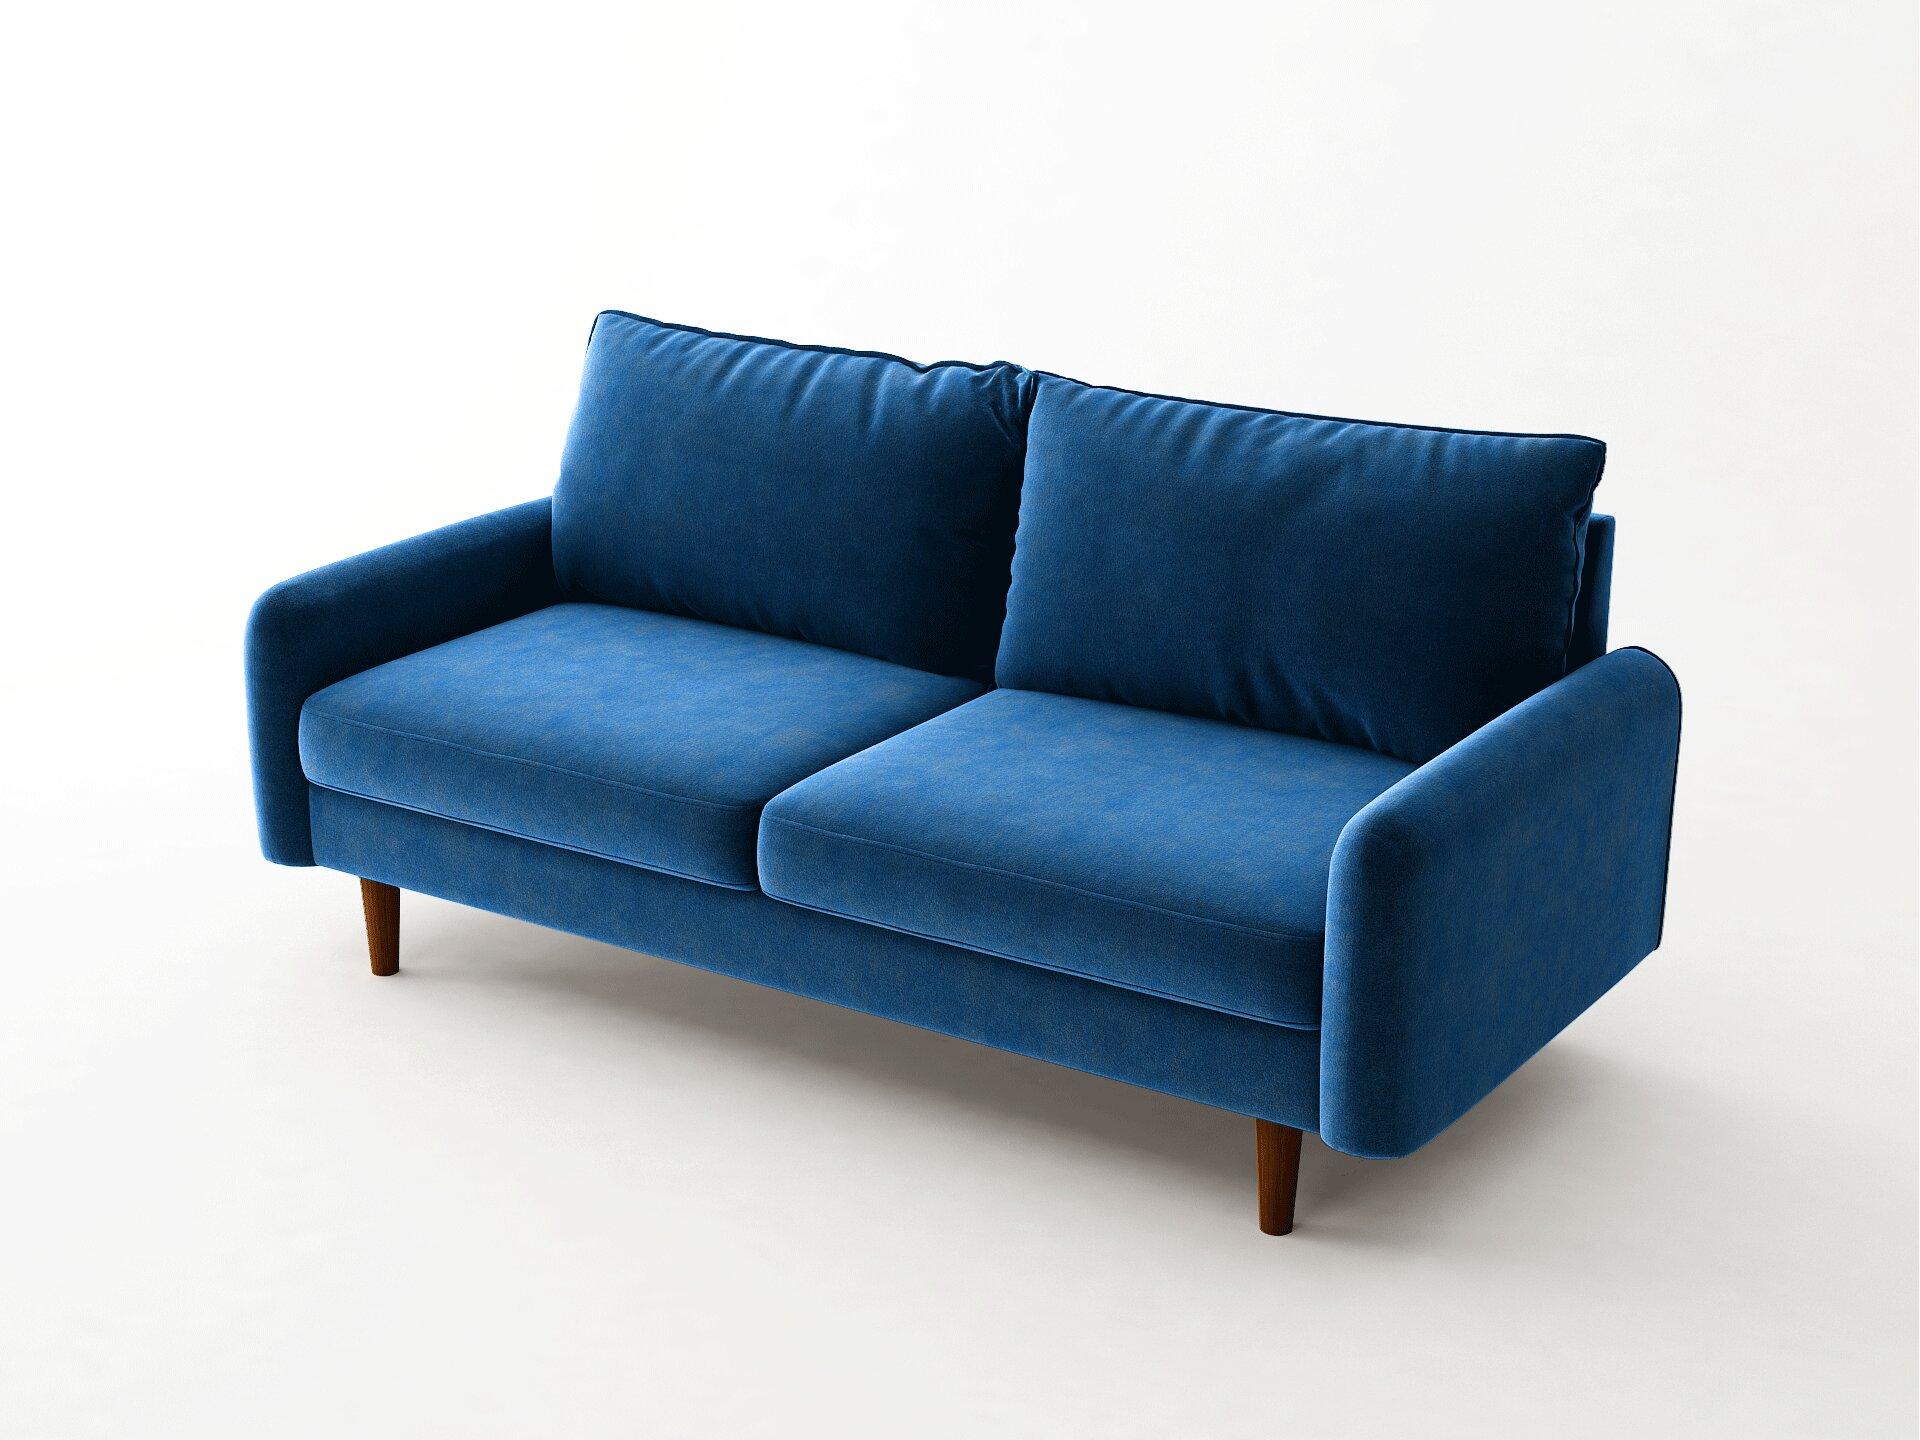 Everly Quinn Lewellen 71 6 Wide Velvet Square Arm Sofa Reviews Wayfair